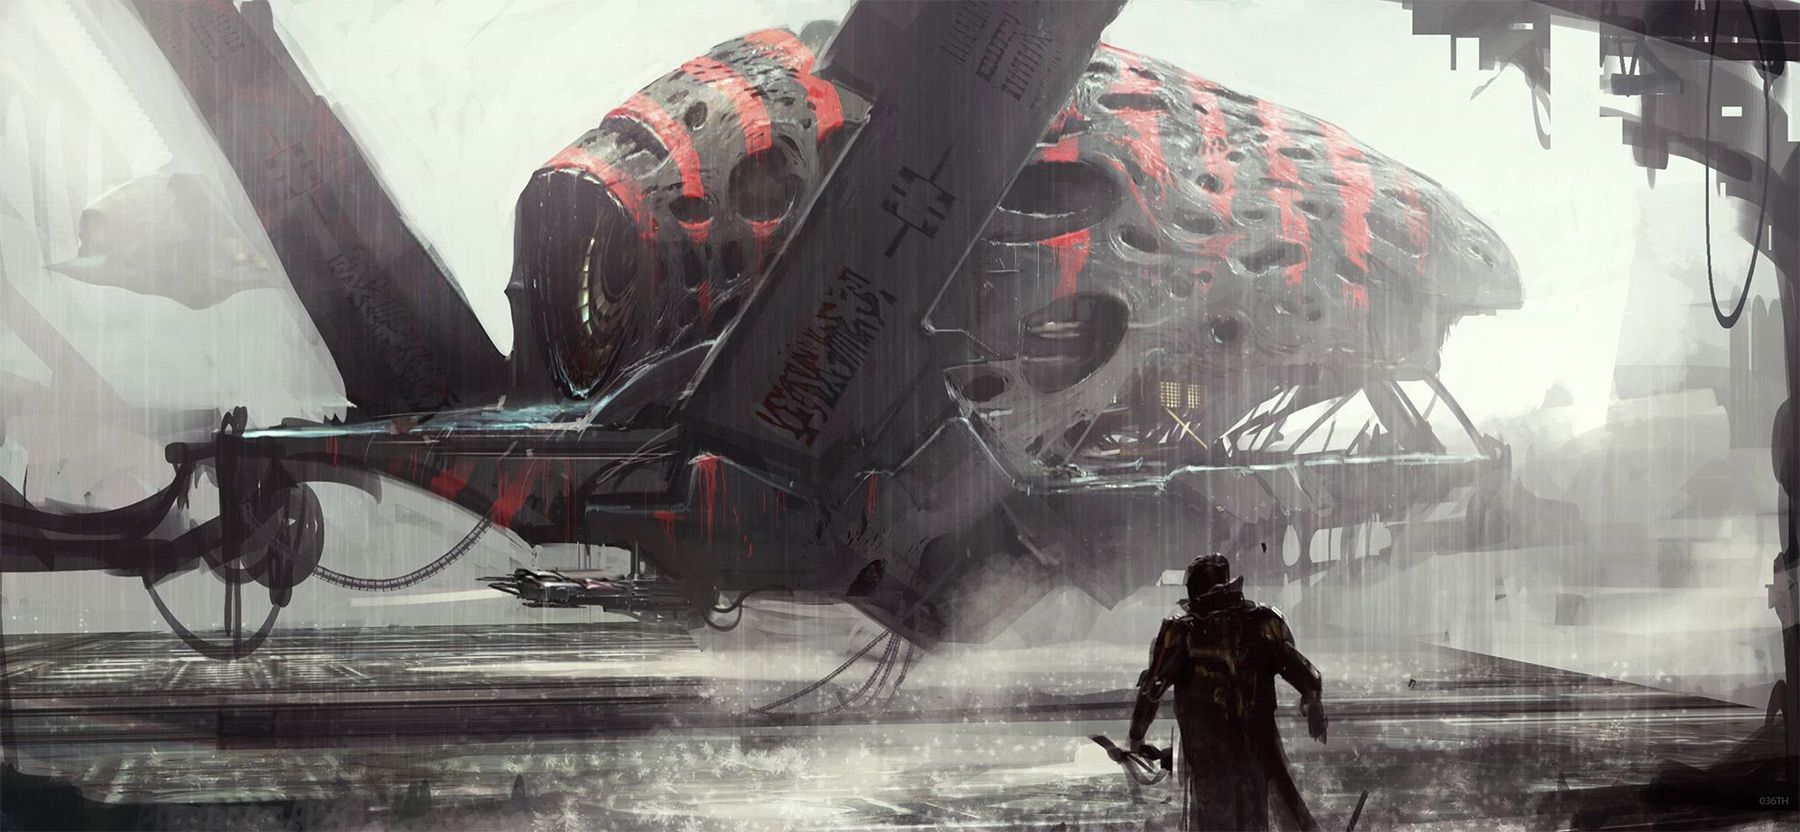 concept ships: Guardians of the Galaxy concept art by Atomhawk Design Ltd.